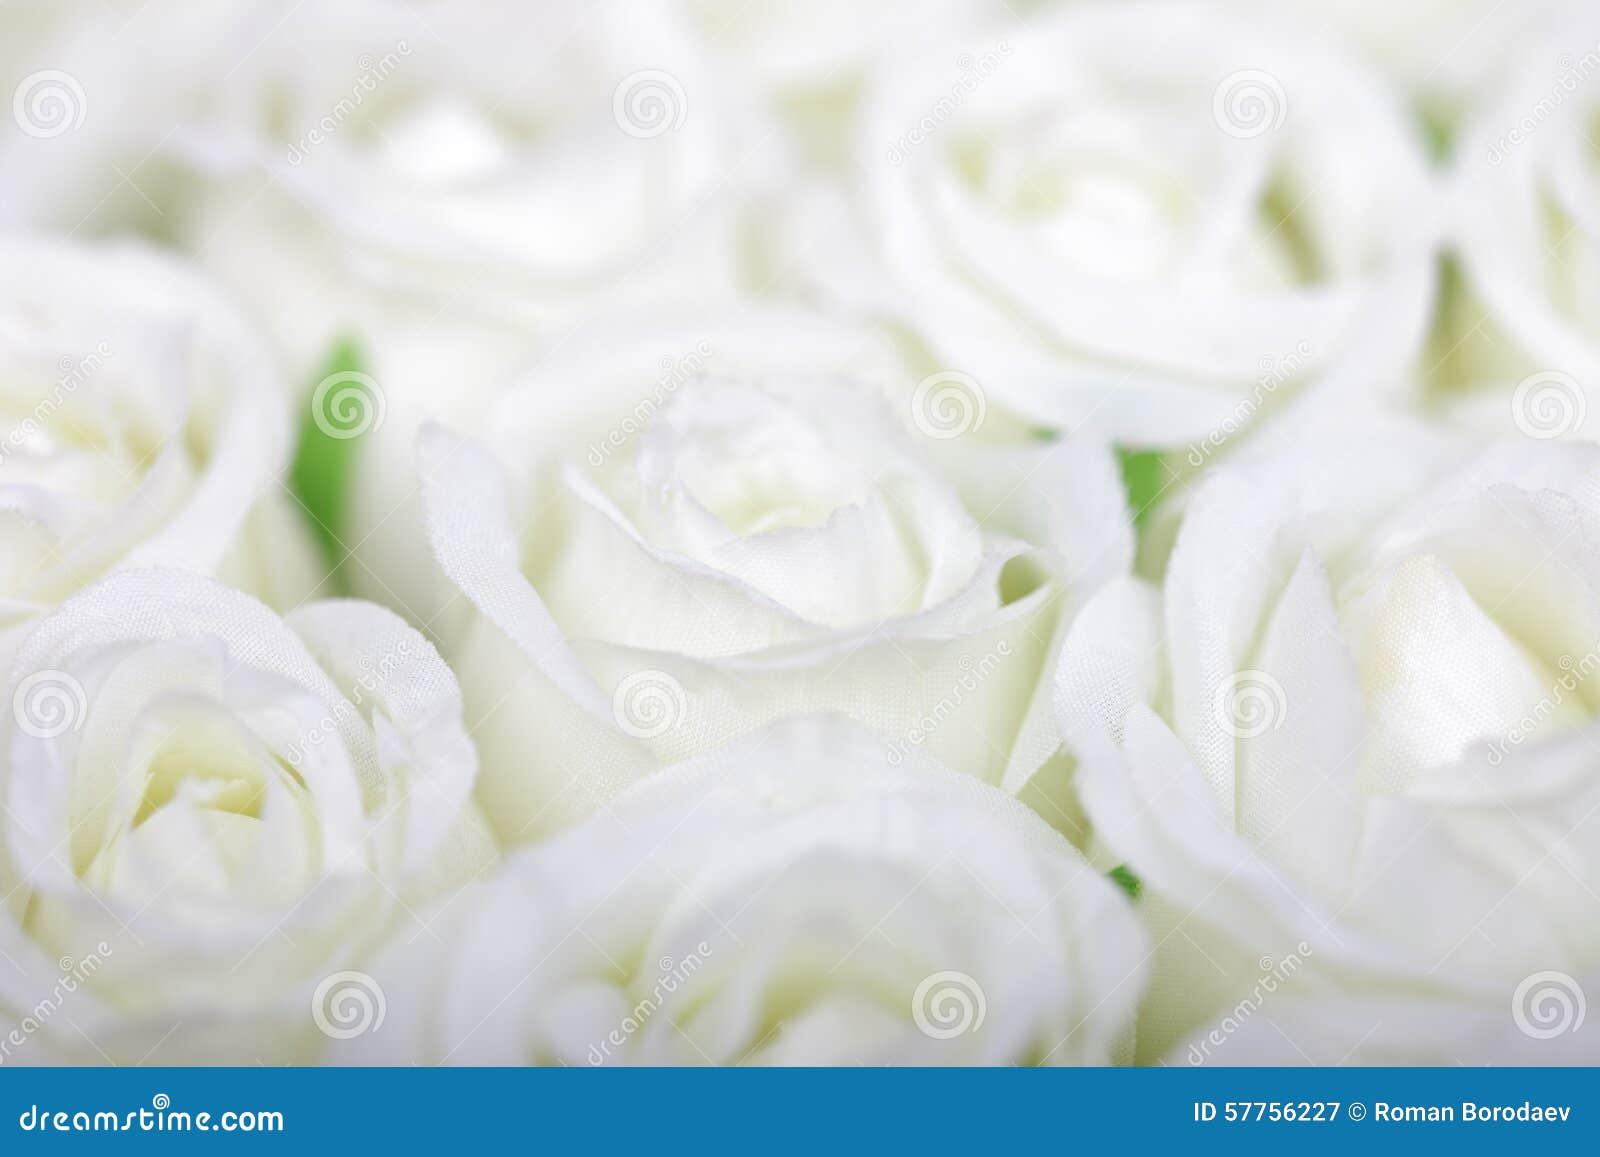 White roses background rose flowers flower wedding closeup fresh isolated bouquet luxury nature beauty bunch cream bridal bride